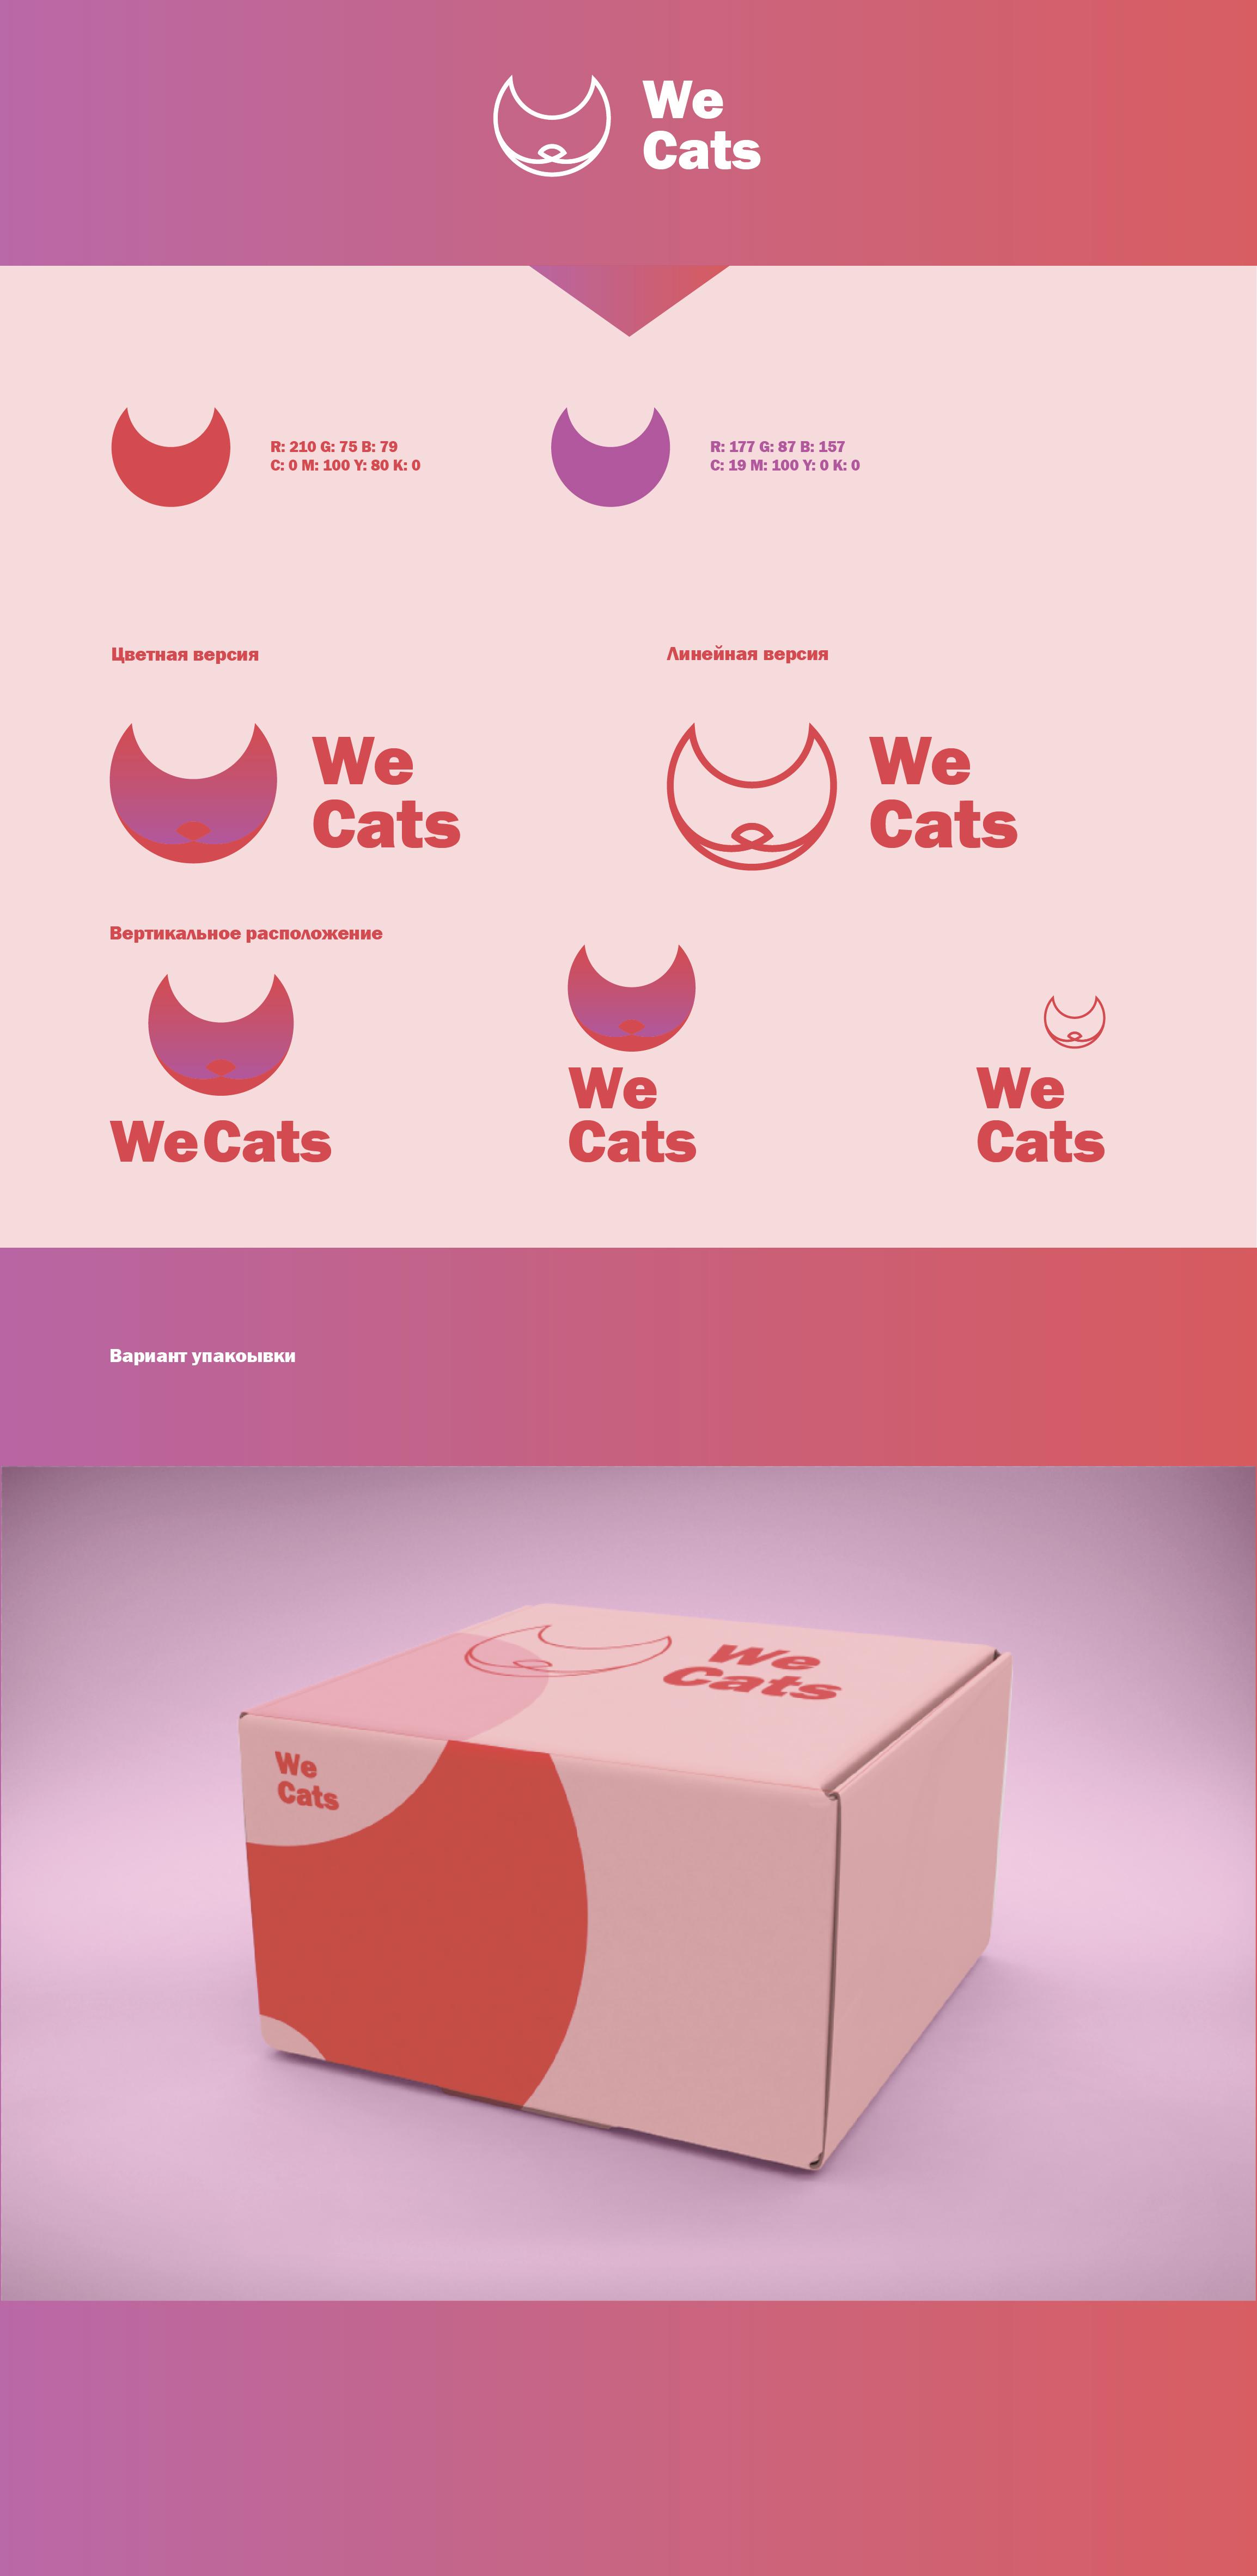 Создание логотипа WeCats фото f_3175f1b206fcaaa4.jpg